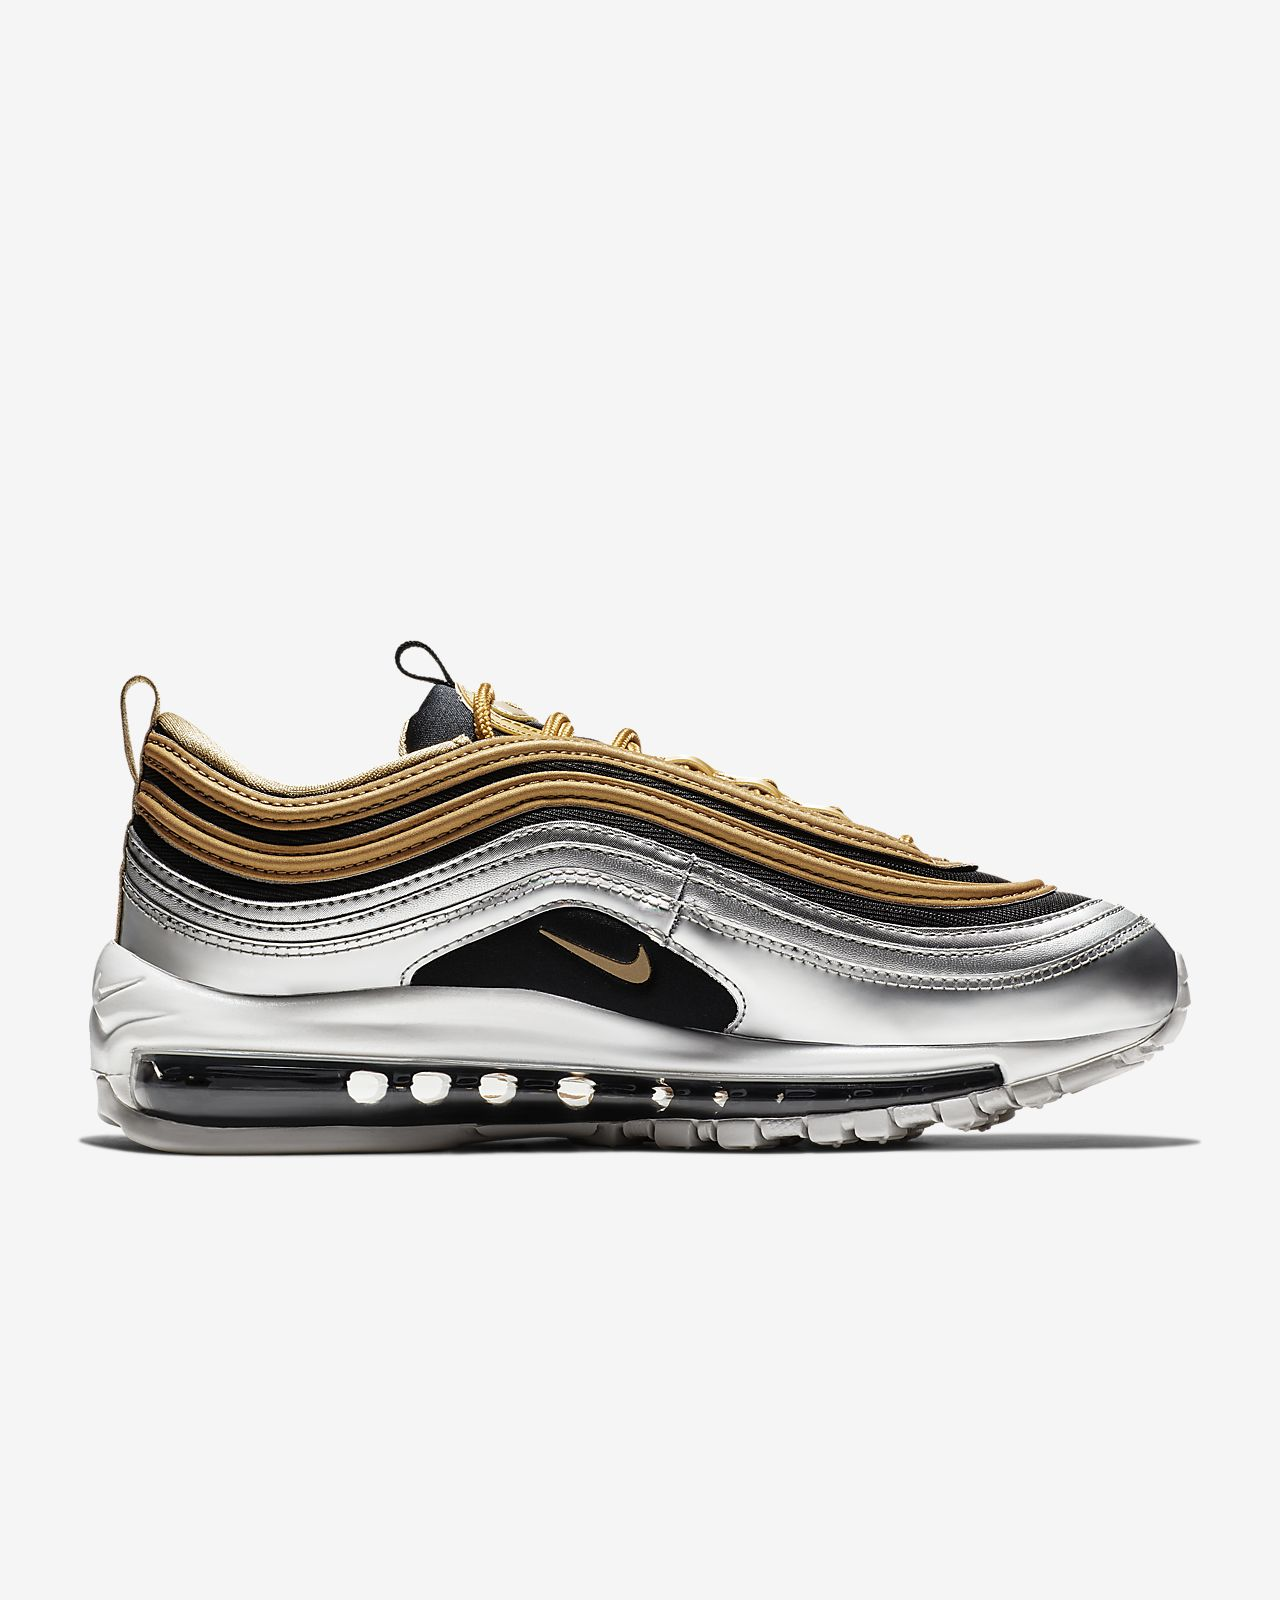 Nike Air Max 97 SE Metallic Damenschuh